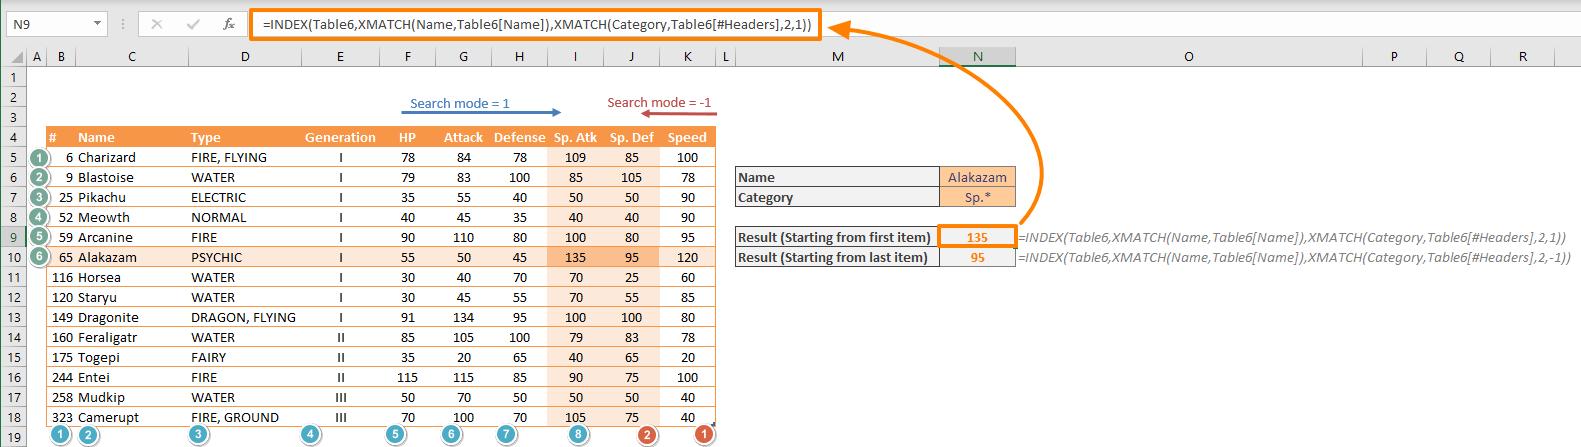 XMATCH Function - Wildcard